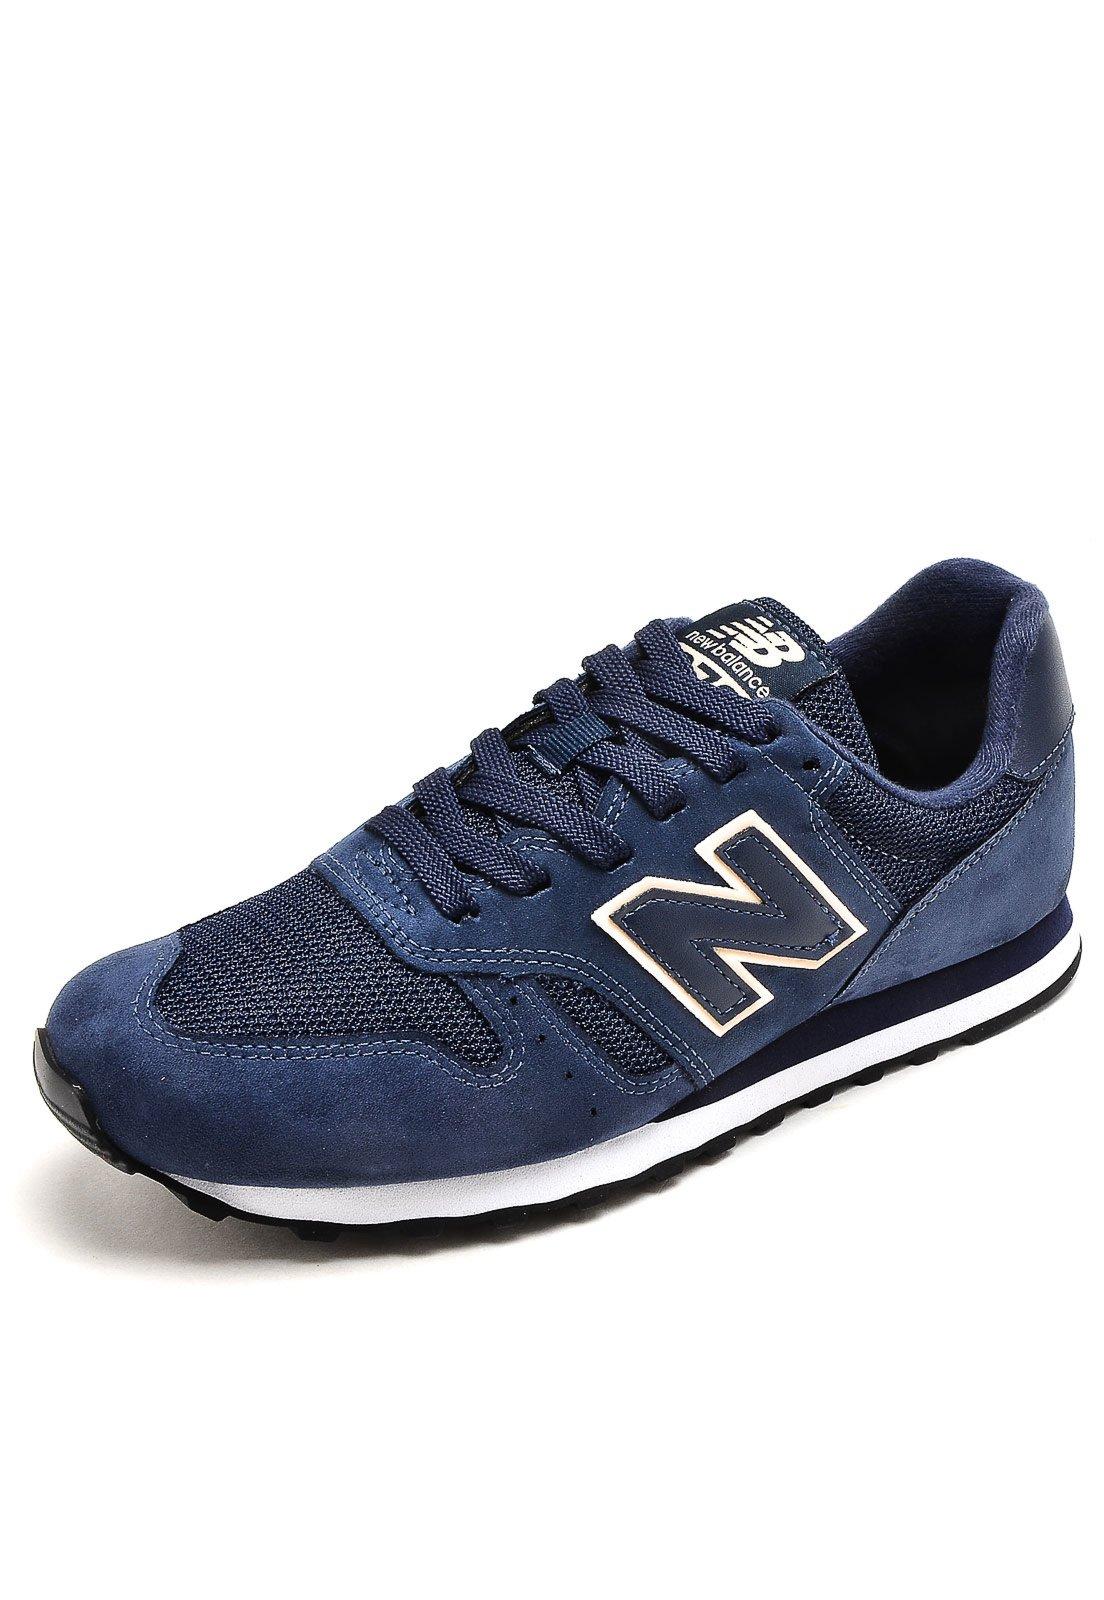 tenis new balance 373 azul marinho